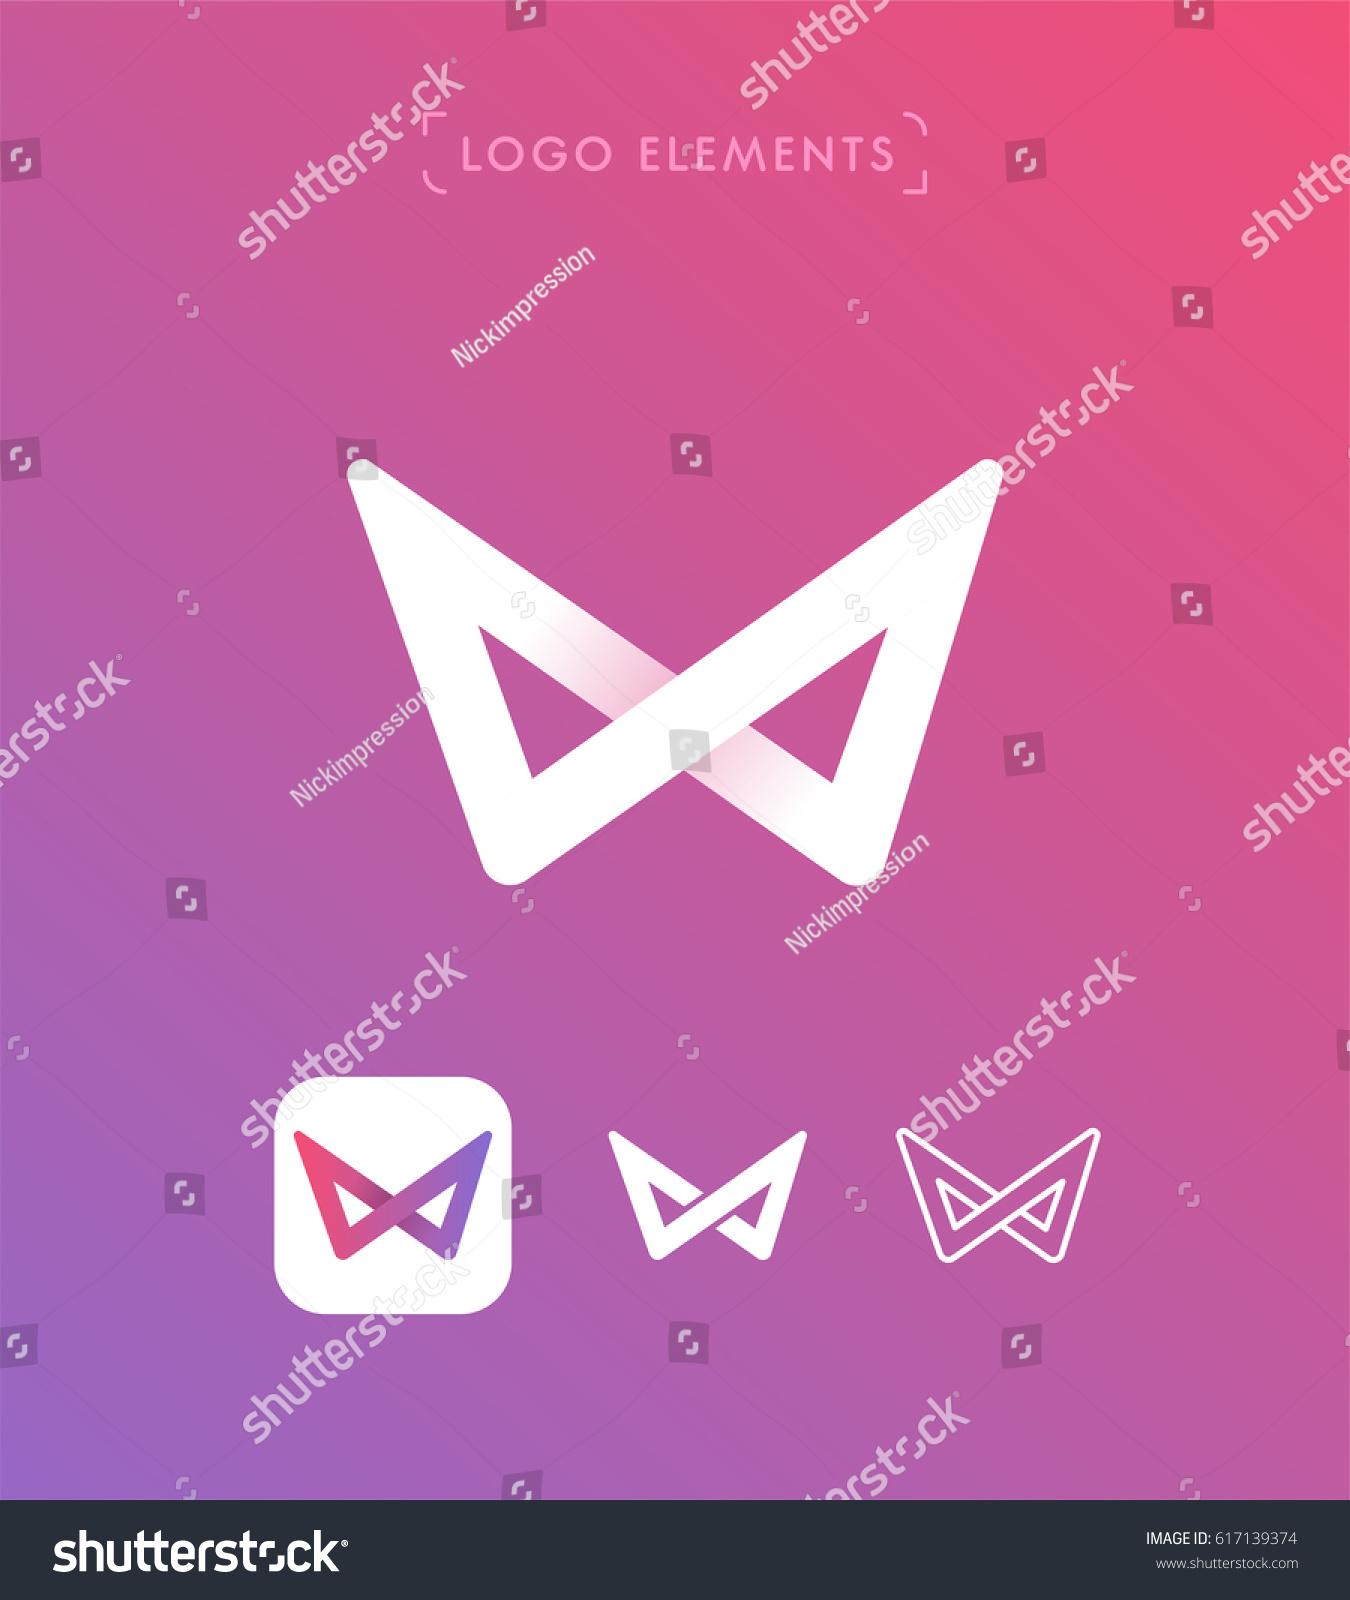 Vector infinity origami logo design template set. App icon